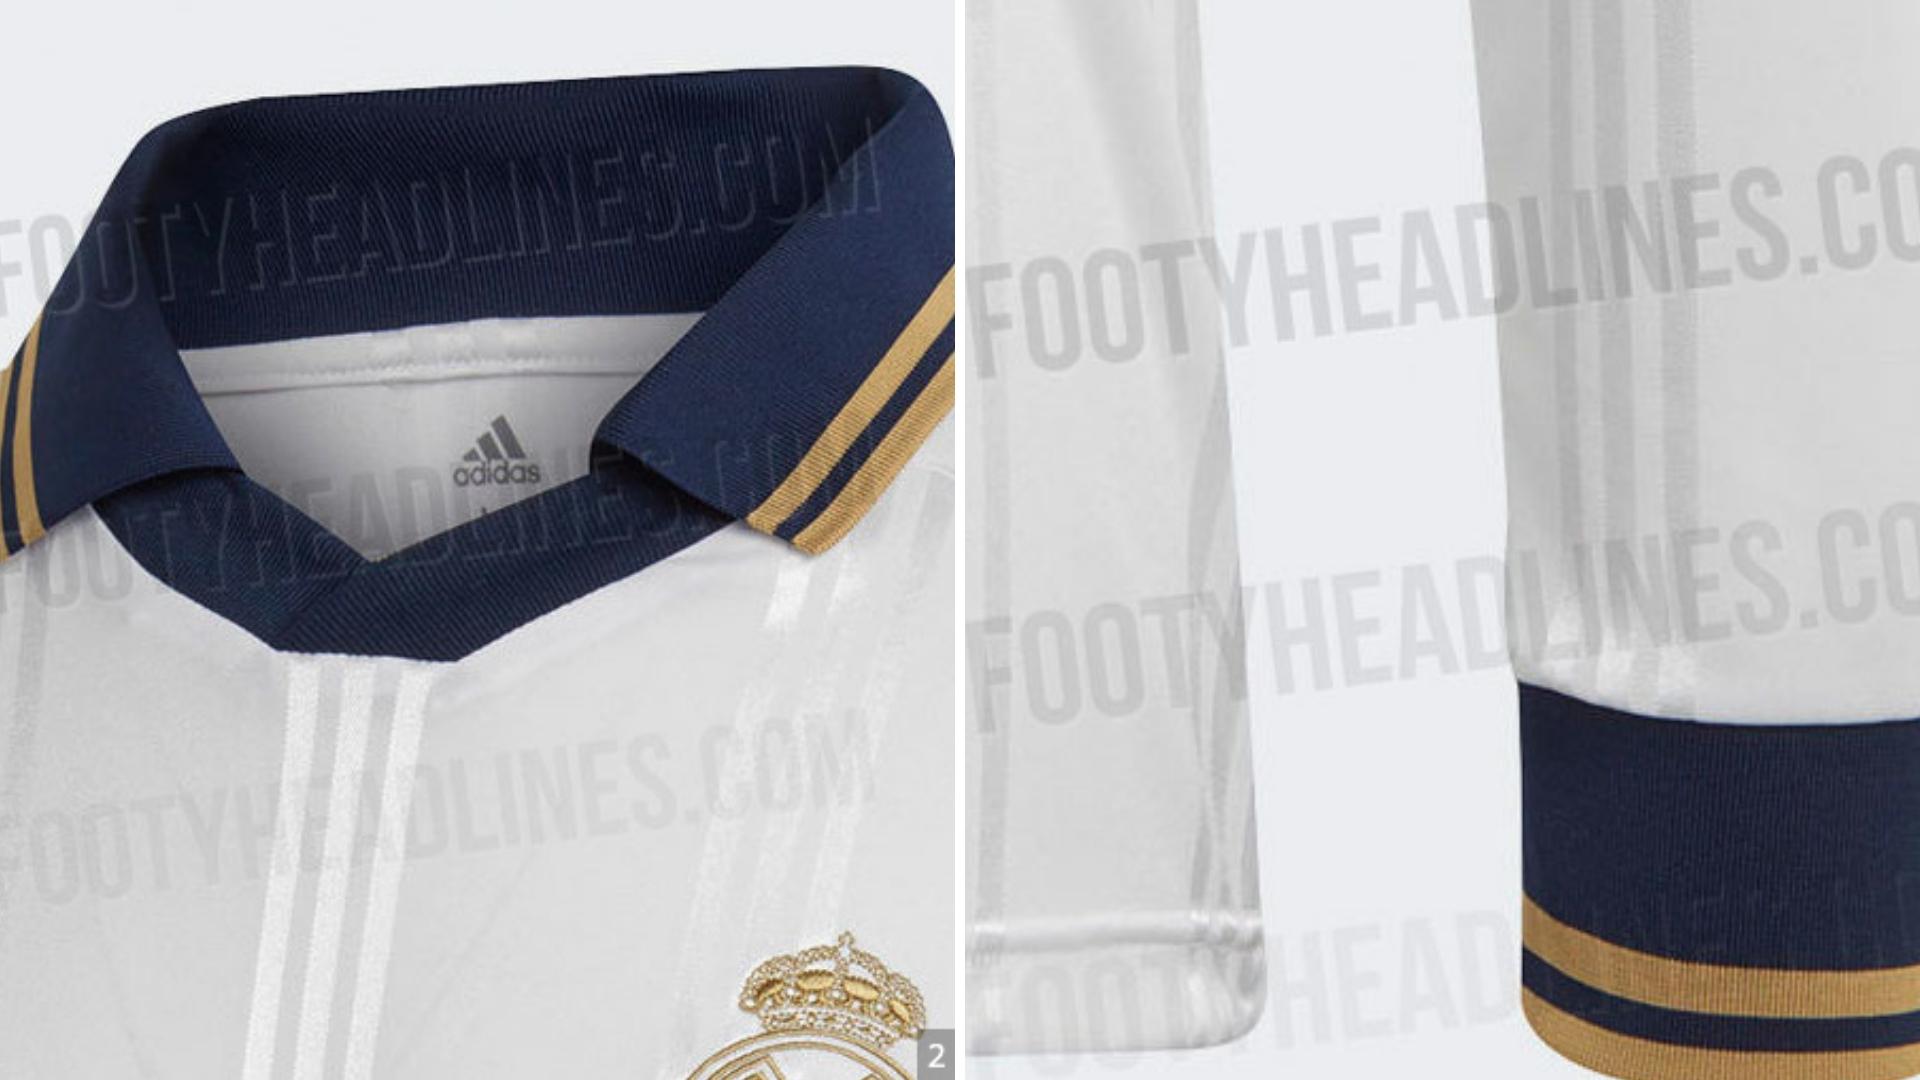 Adidas' Real Madrid 201920 Icon Retro Jersey Has Leaked